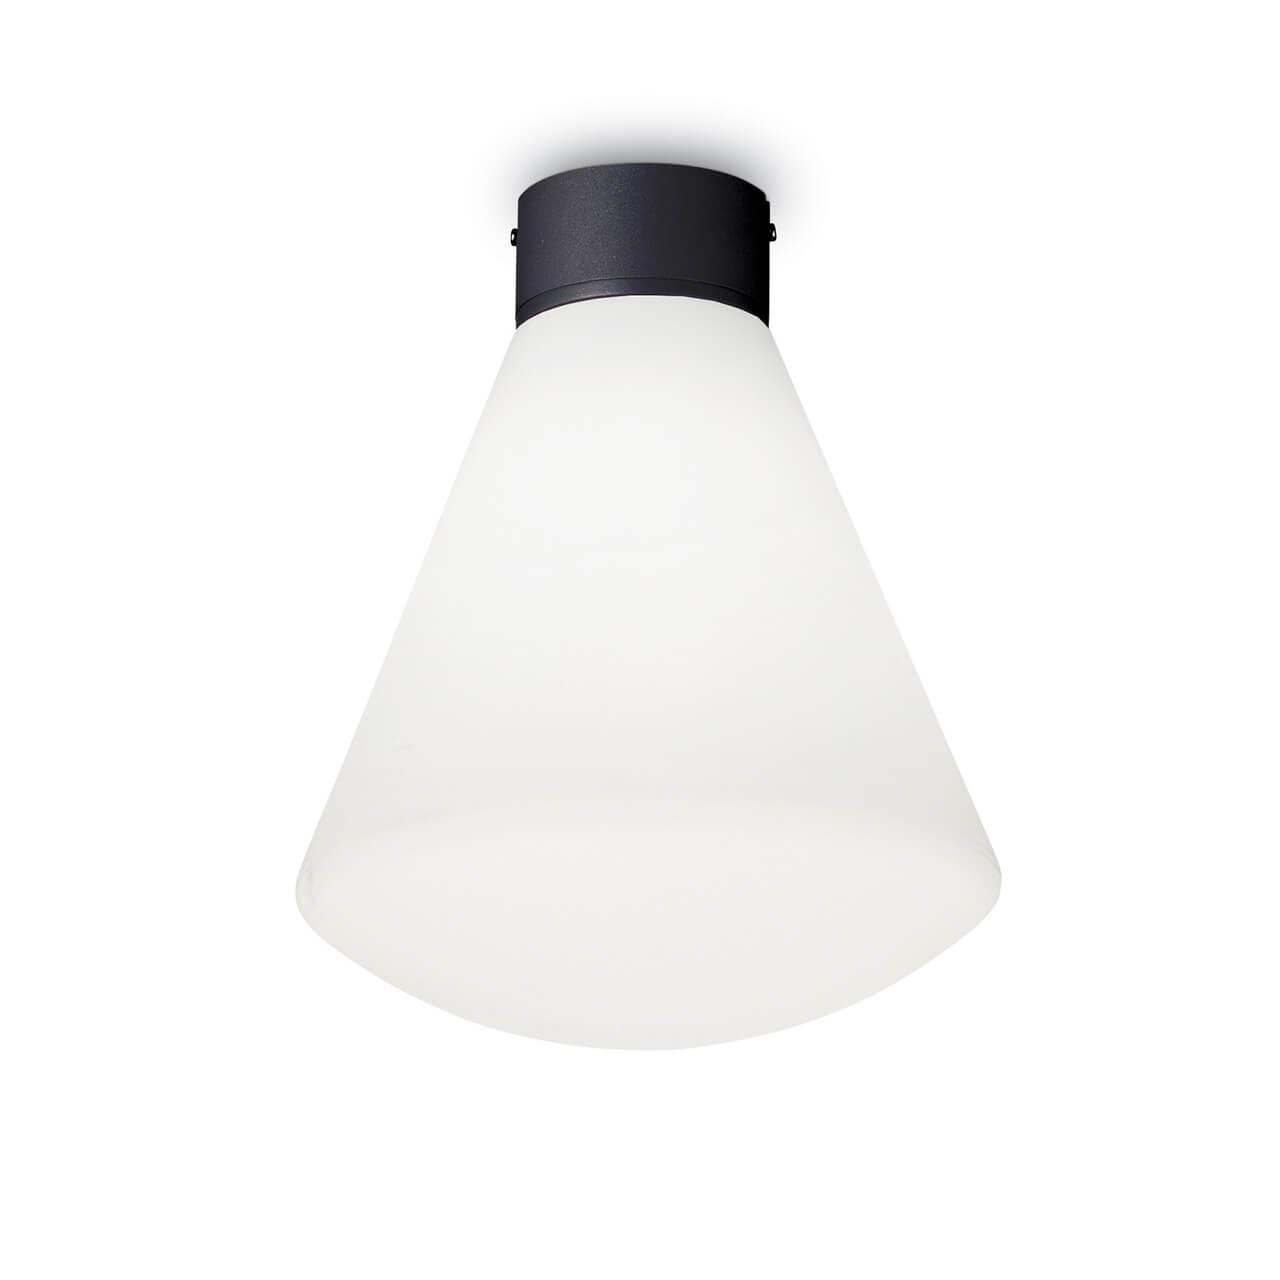 Уличный светильник Ideal Lux Ouverture PL1 Nero